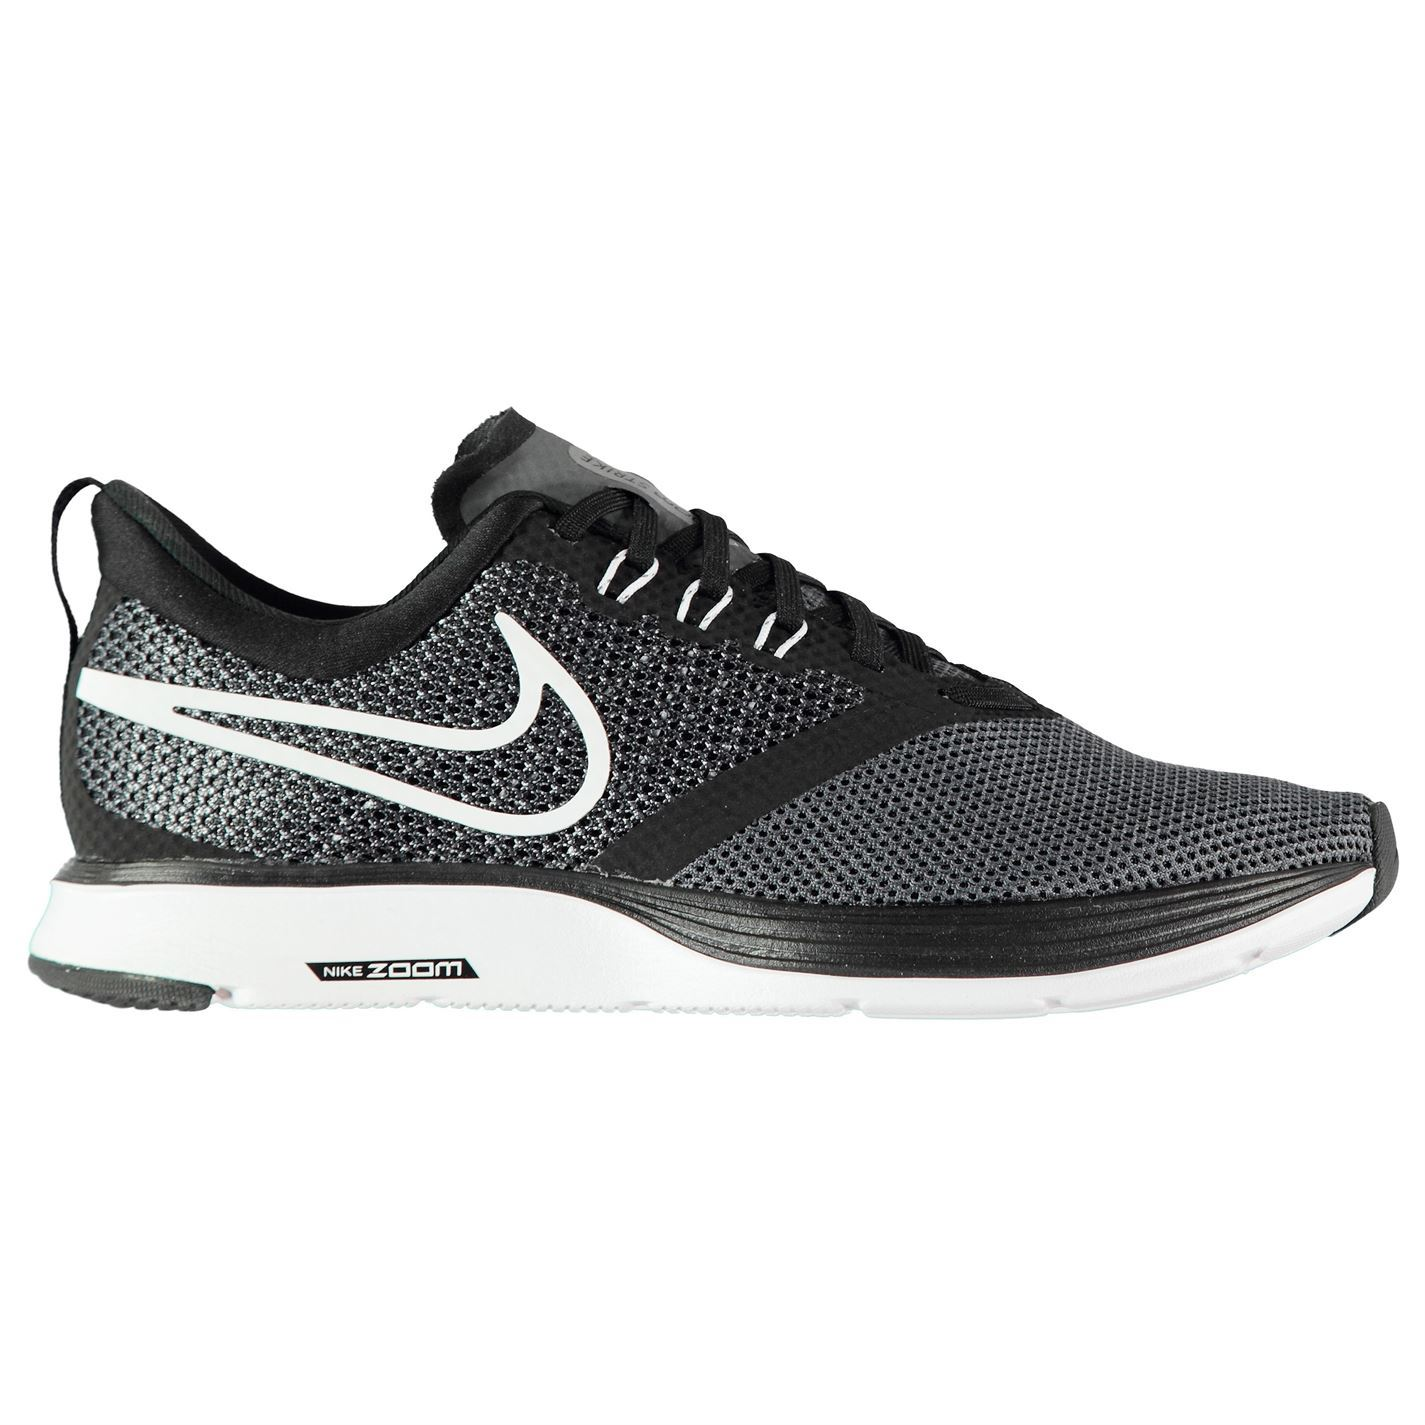 2nike strike scarpe